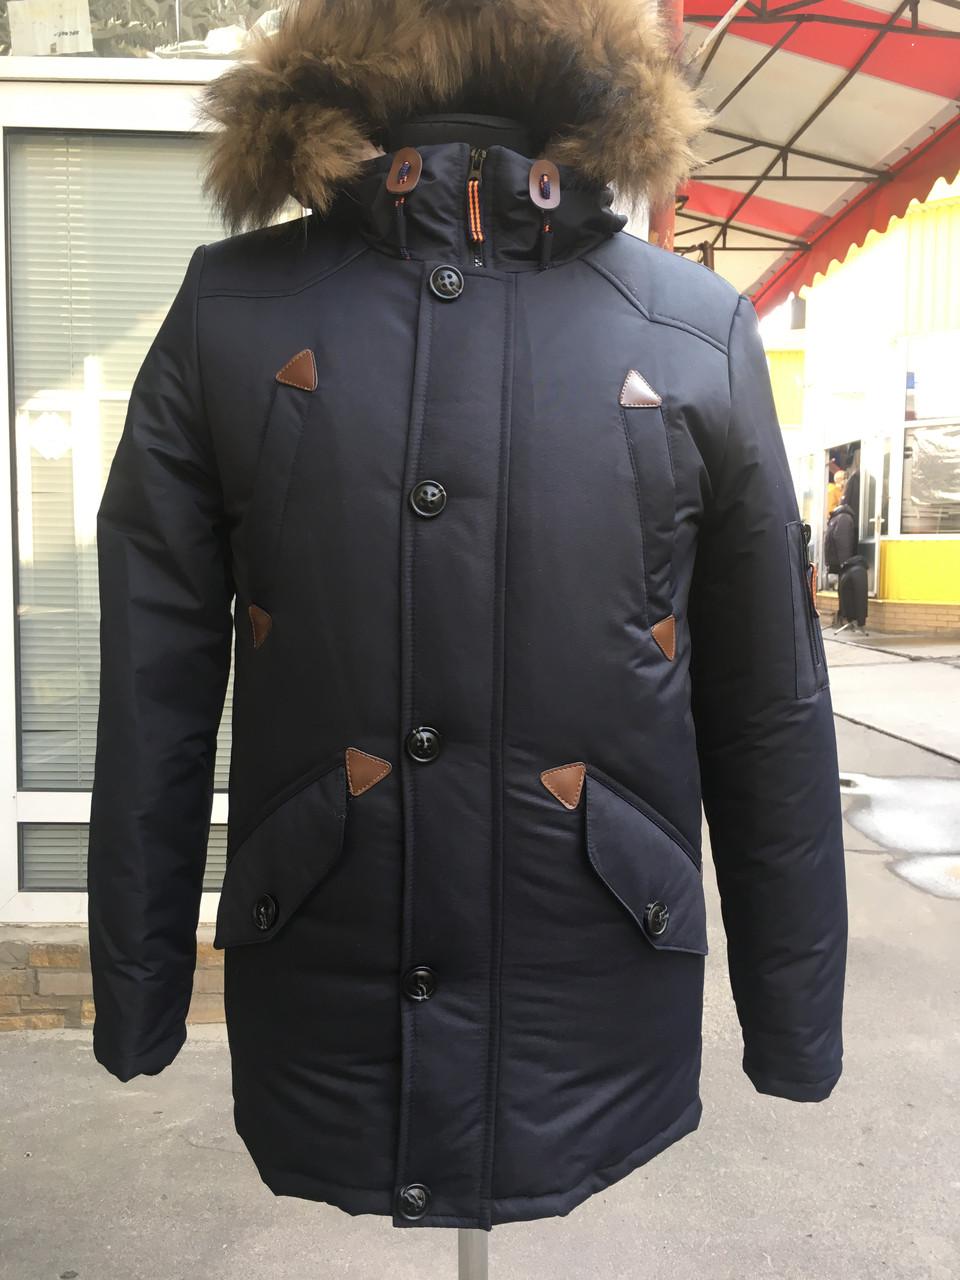 25e5198efd4 Зимняя мужская парка на овчине - CityStile - Интернет-магазин одежды от  производителя в Харькове